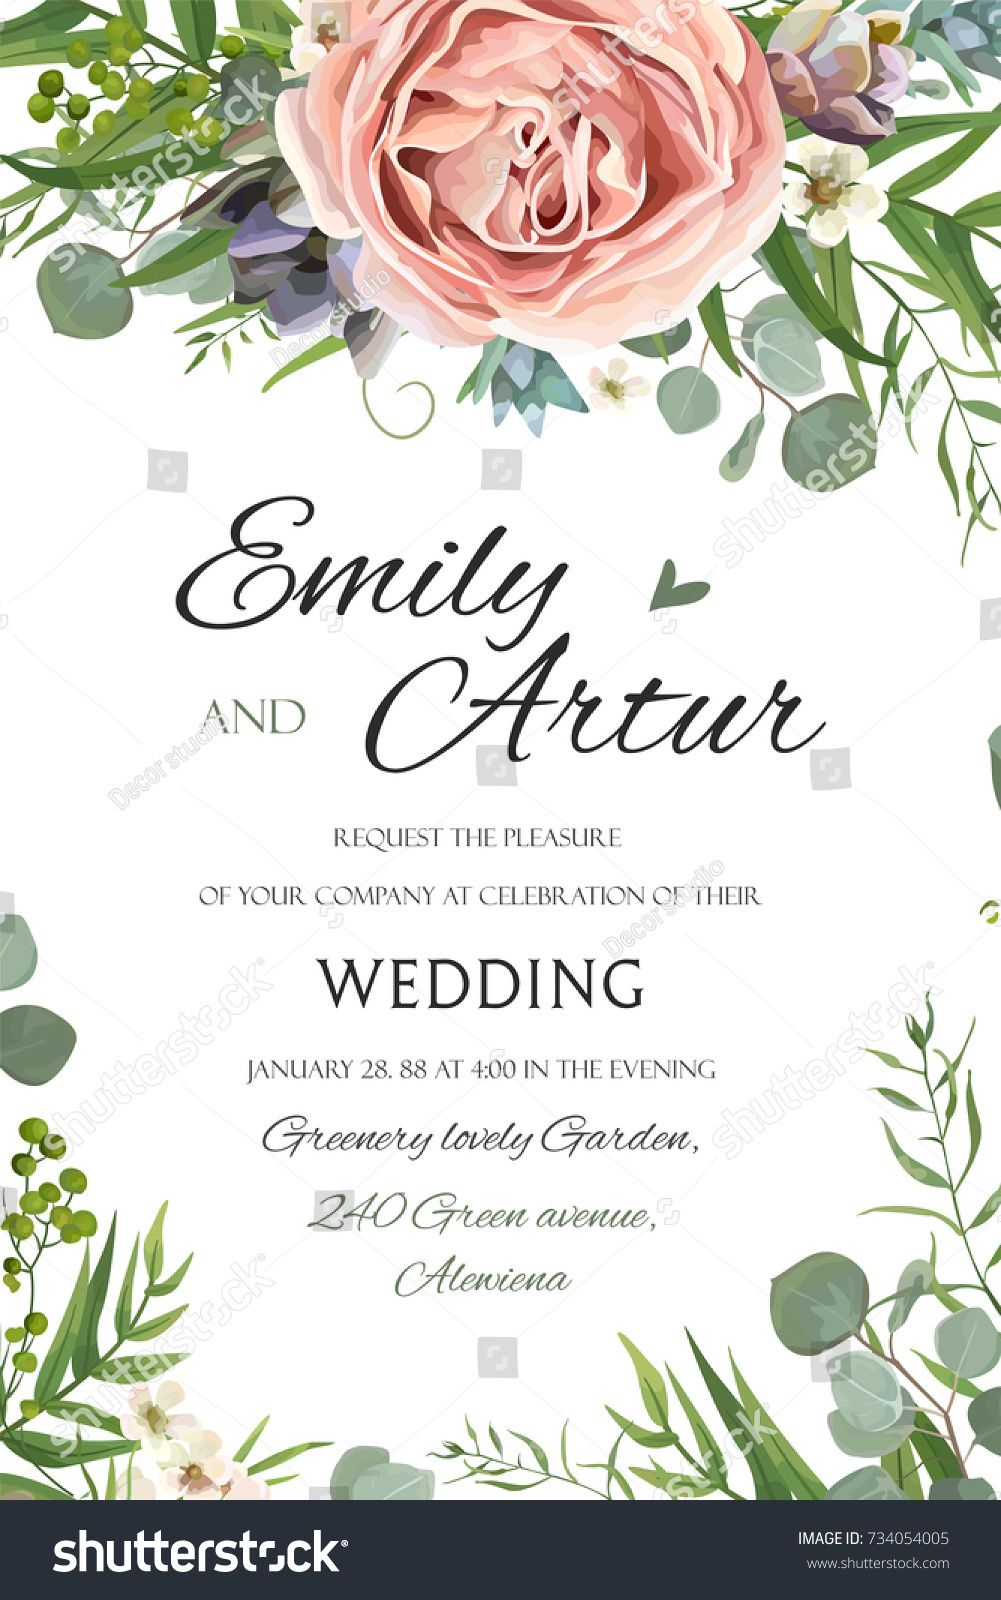 Wedding invitation invite save the date floral card vector design wedding invitation invite save the date floral card vector design garden lavender pink peach stopboris Gallery